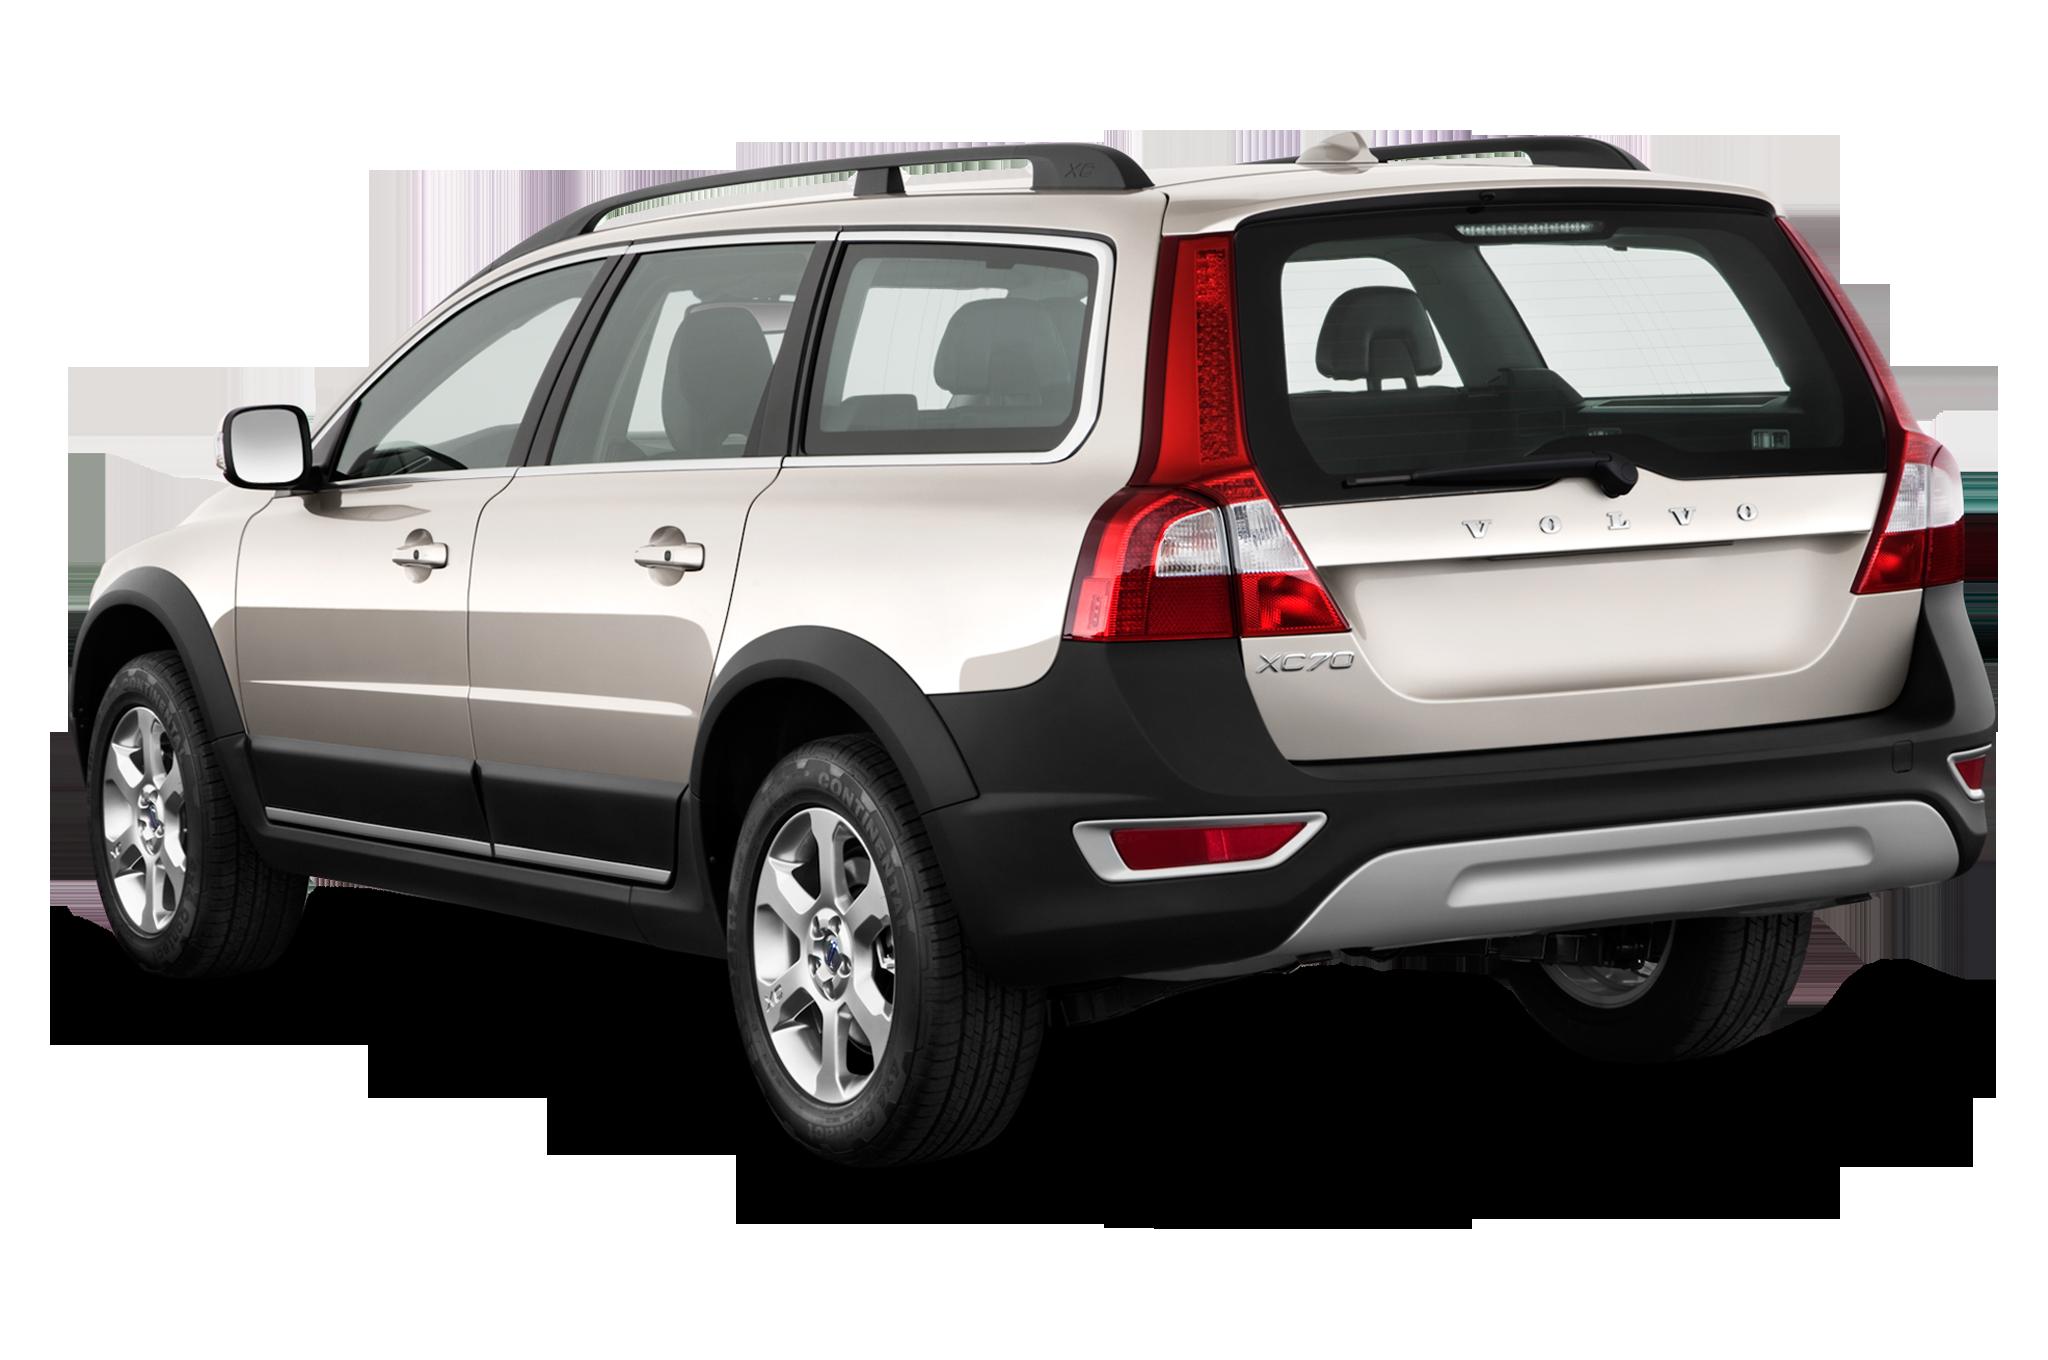 2011 volvo xc70 3.2 fwd auto wagon angular rear - 2011 Volvo Xc70 3 2